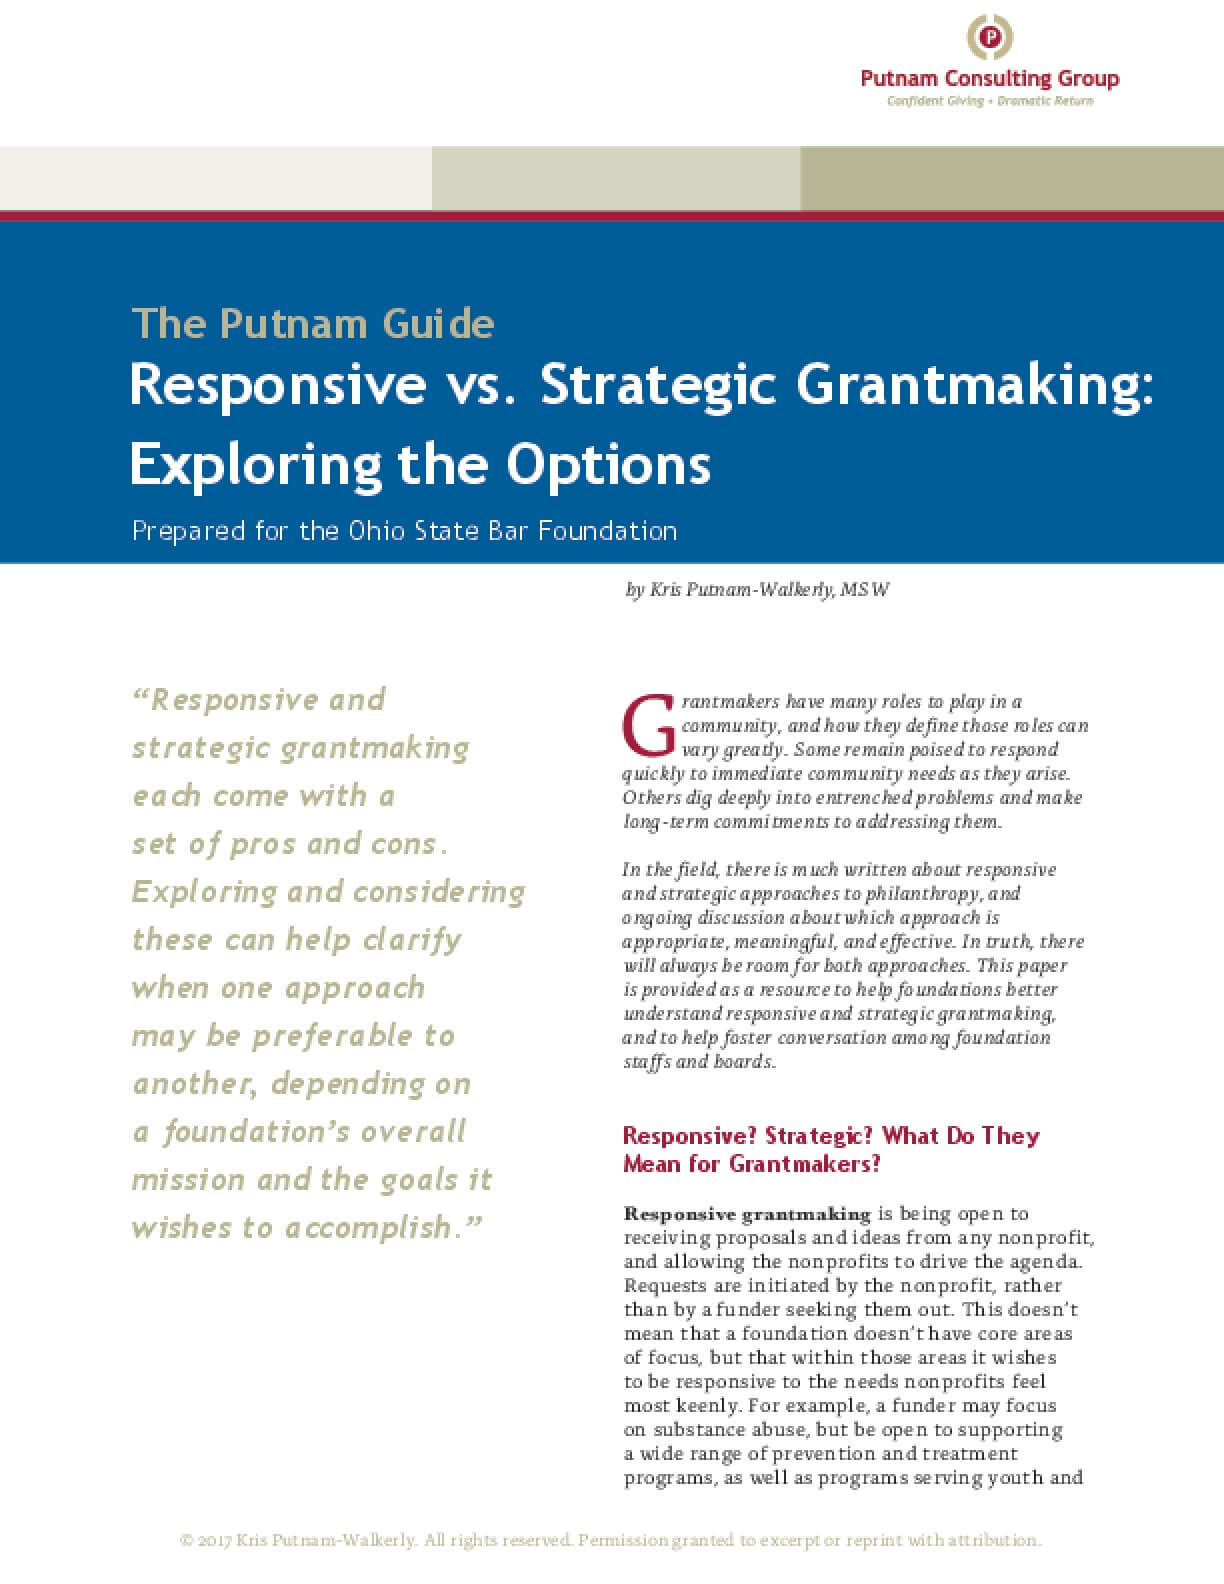 Responsive vs. Strategic Grantmaking: Exploring the Options